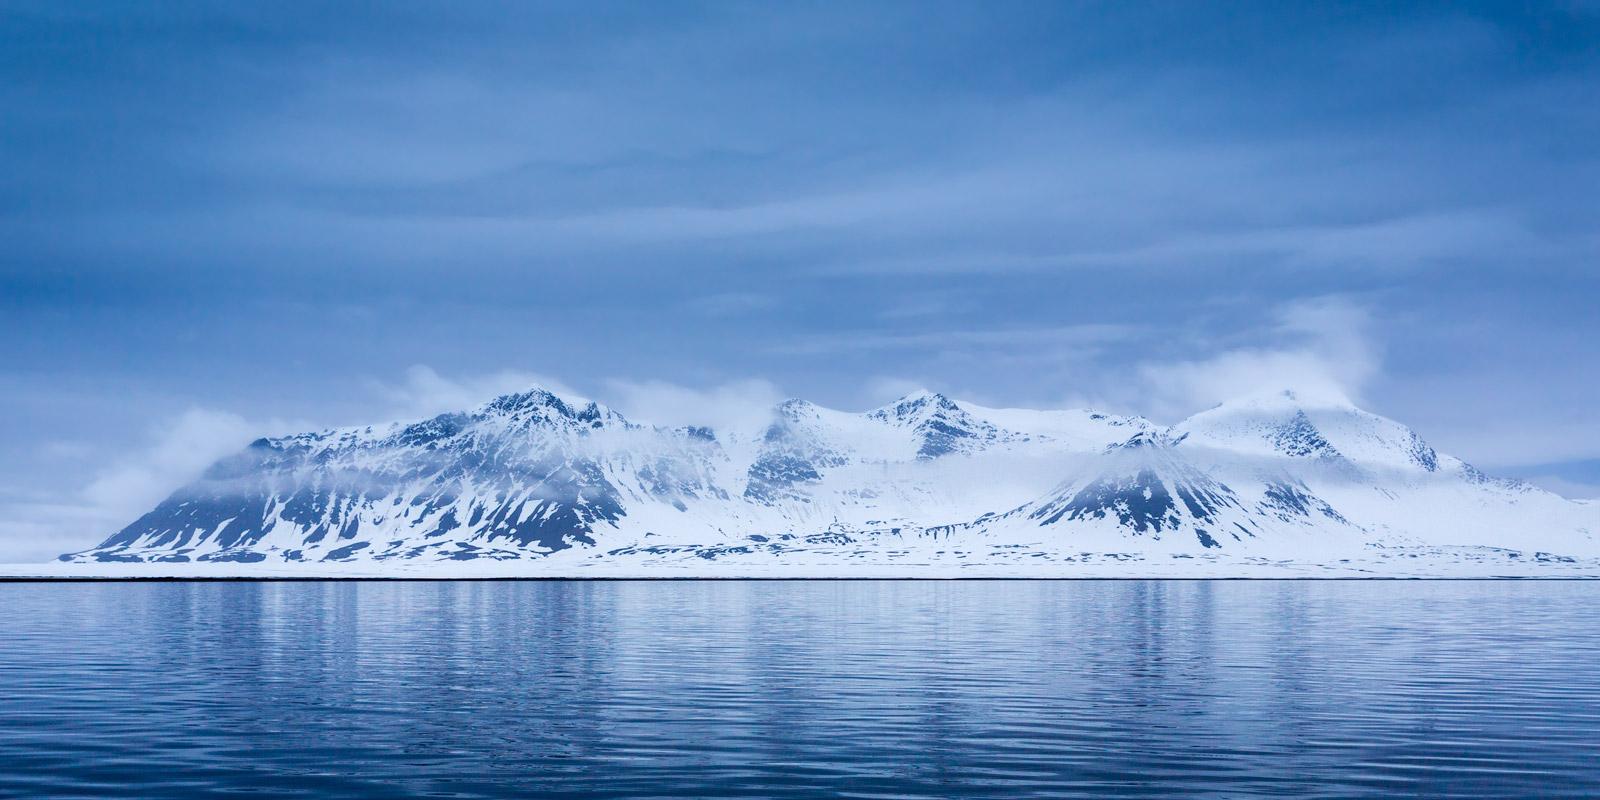 Norway, Spitsbergen, Mountain, limited edition, photograph, fine art, landscape, photo